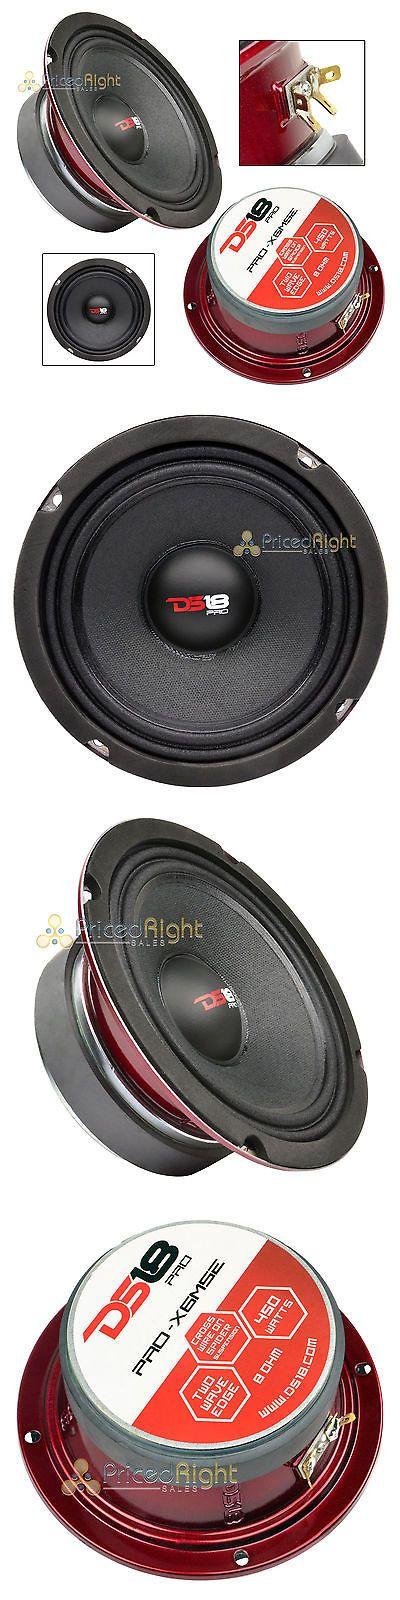 Car Speakers and Speaker Systems: Ds18 Pro-X6mse 6.5 Midrange Speaker Slim 450 Watt Max Mid Loudspeaker Car Audio -> BUY IT NOW ONLY: $37.95 on eBay!